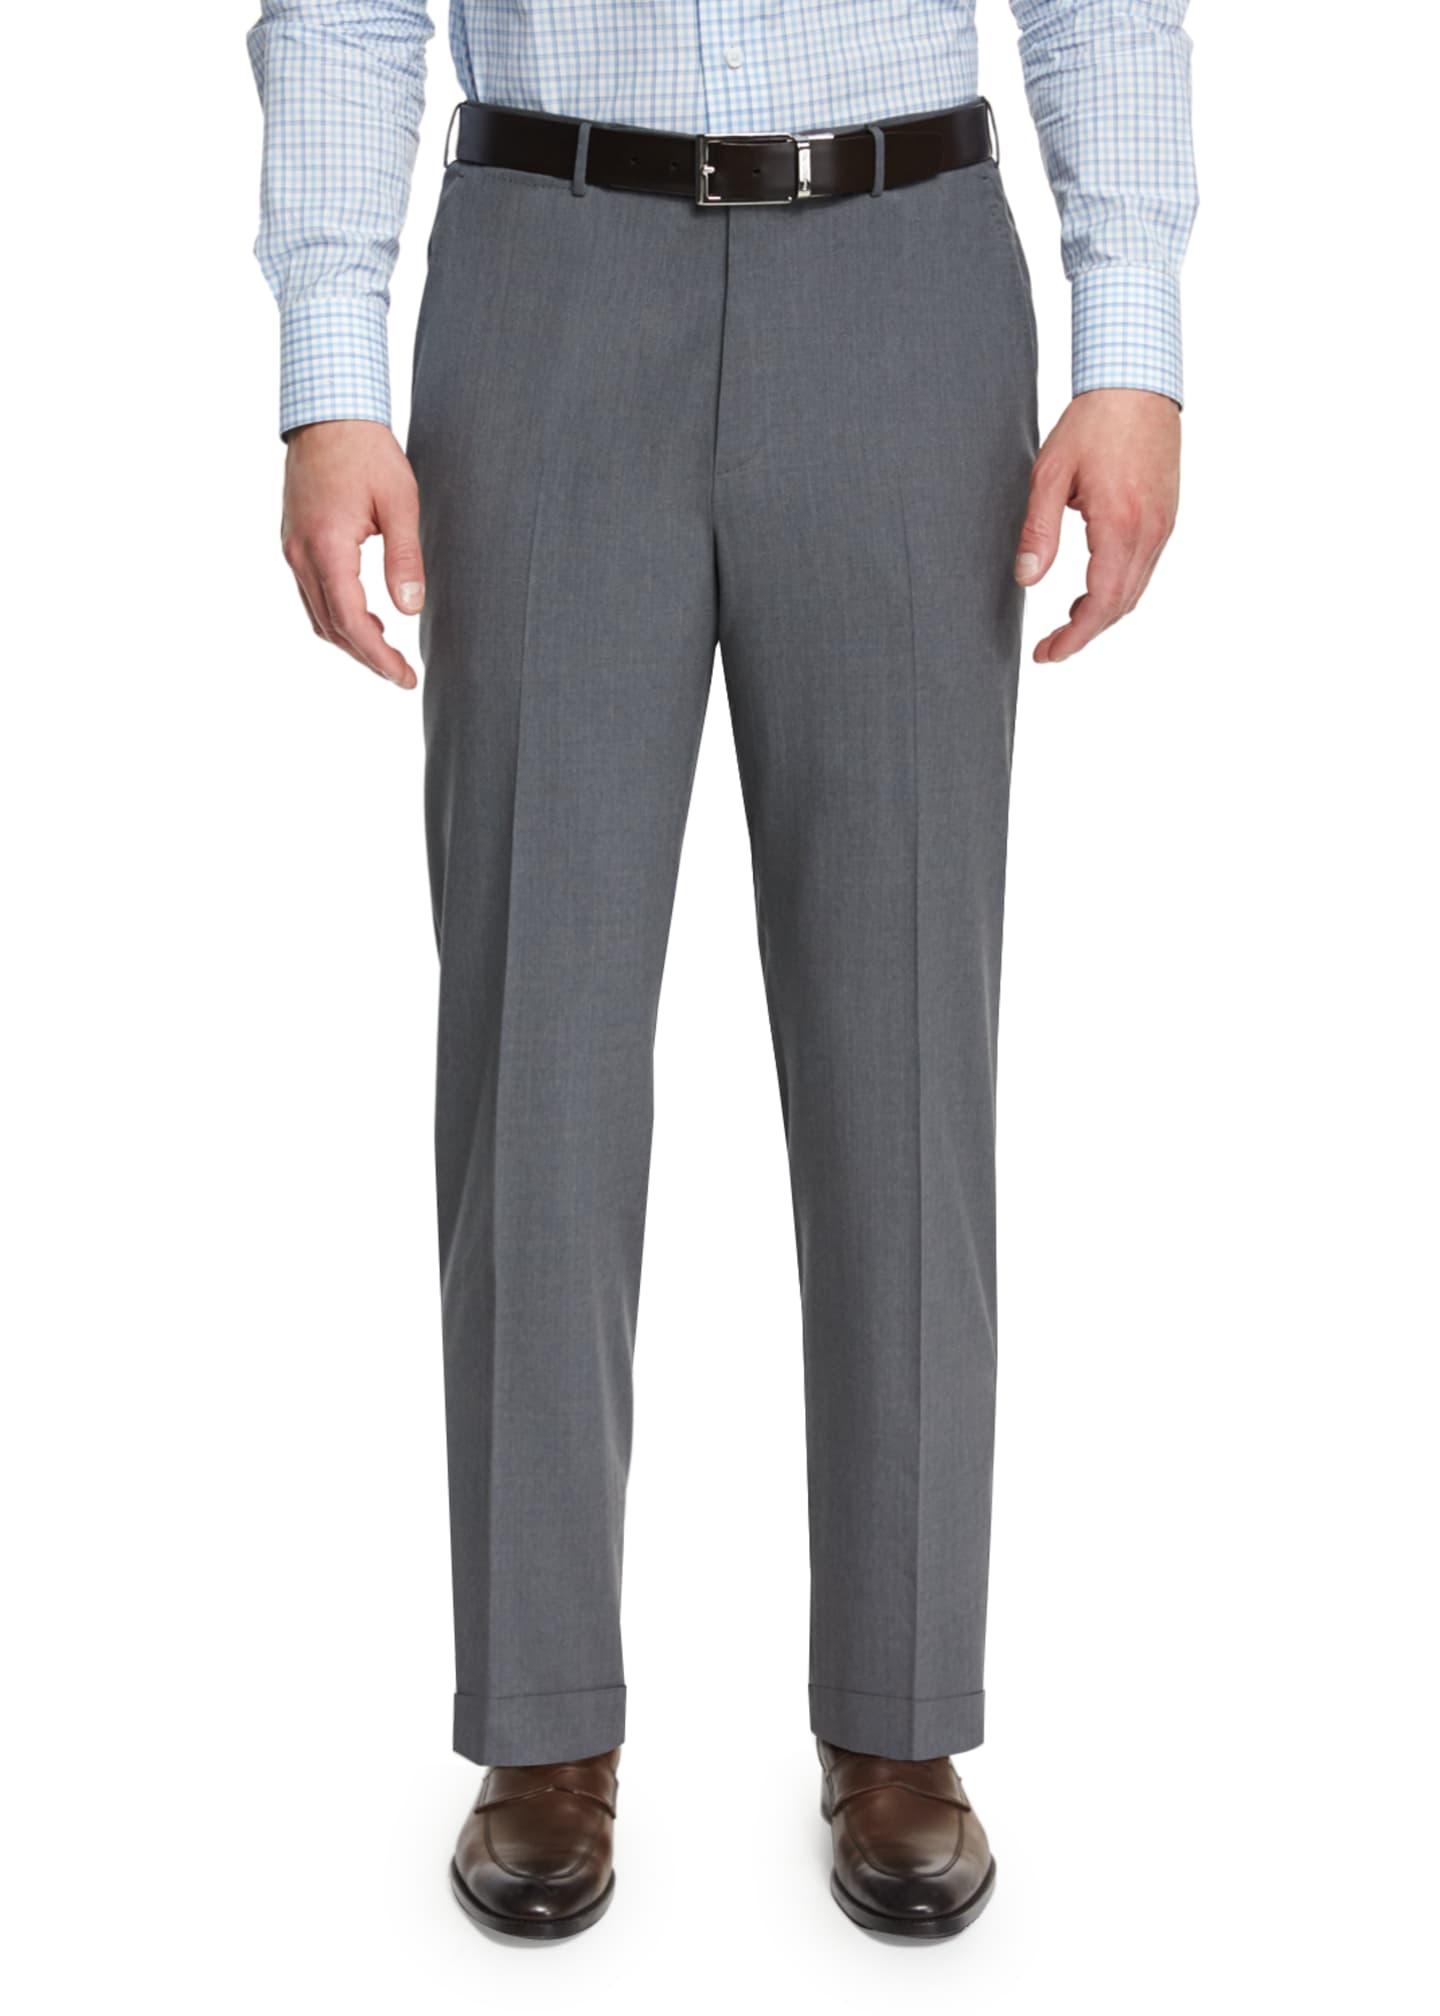 Ermenegildo Zegna High-Performance Wool Twill Trousers, Gray